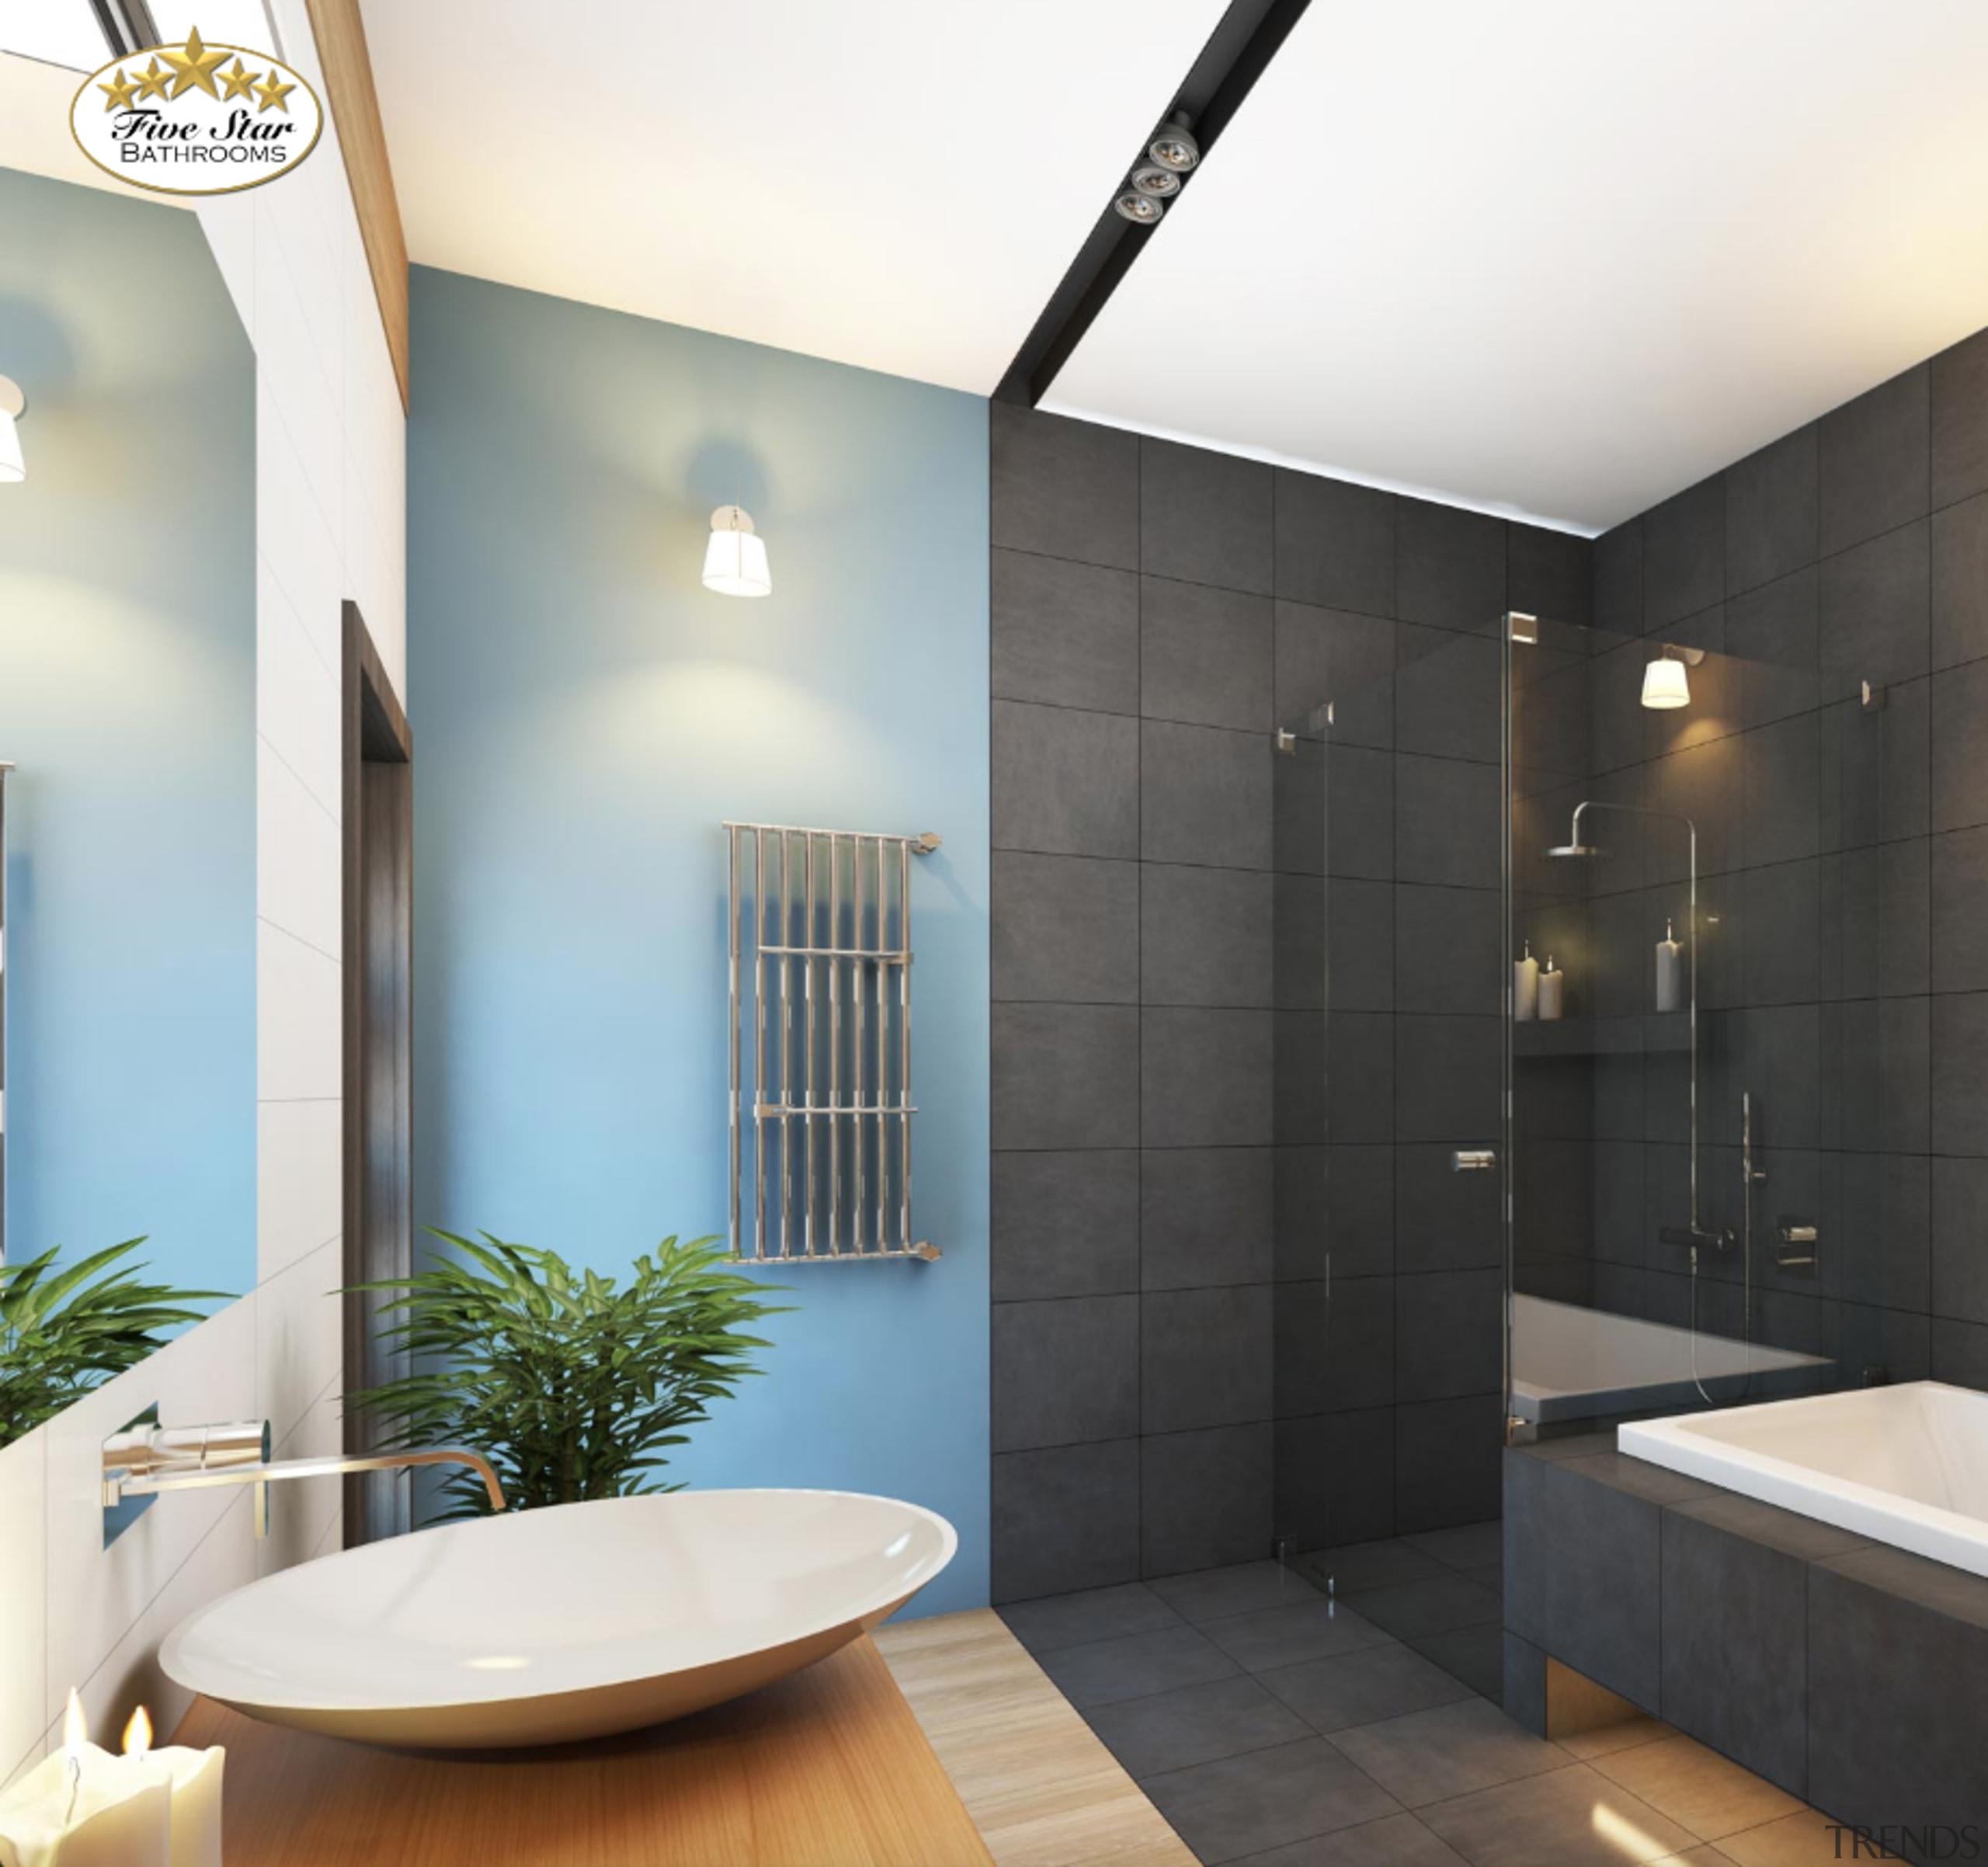 Bathroom by Five Star Bathrooms bathroom, ceiling, home, interior design, room, tile, wall, white, black